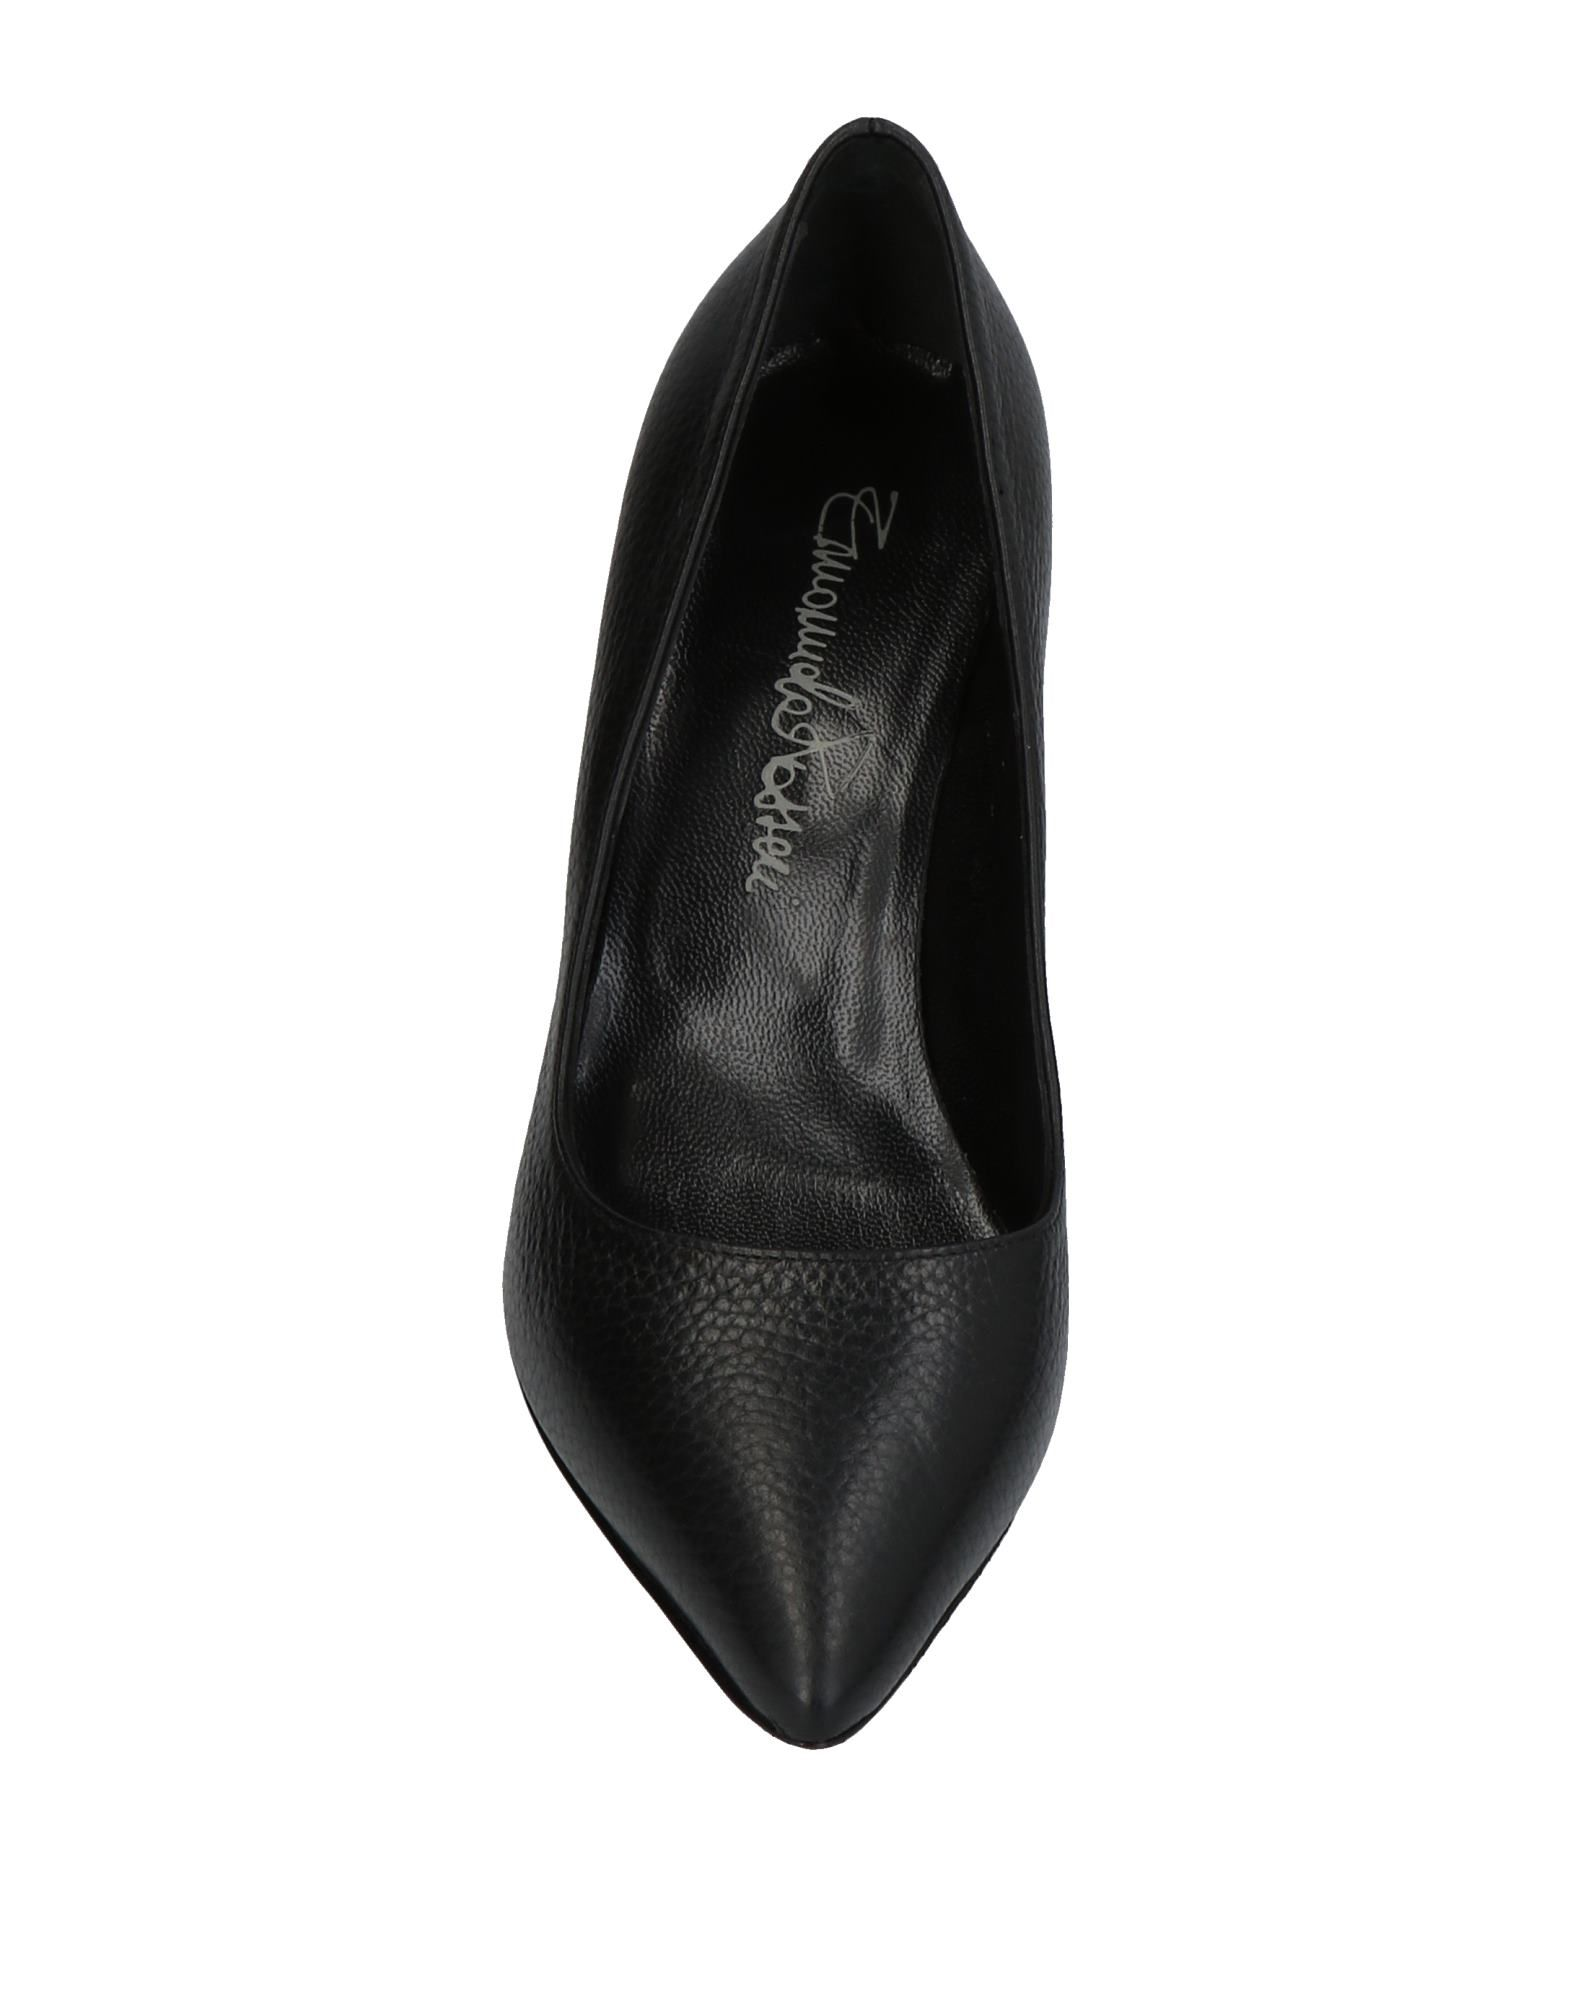 Emanuela Passeri Pumps Damen  11444759RA Gute Qualität beliebte Schuhe